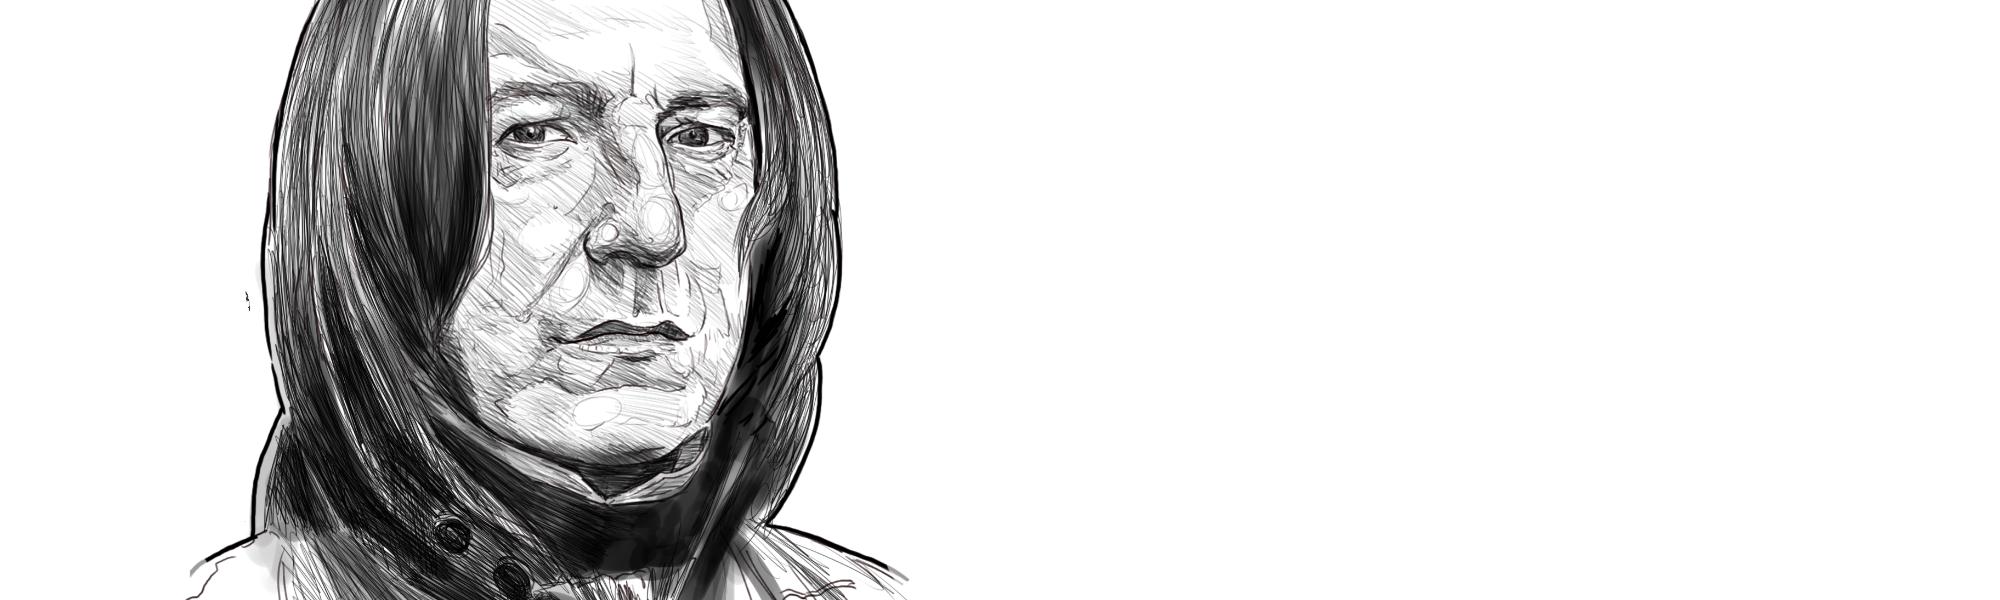 Digital Custom Illustration of Professor Snape